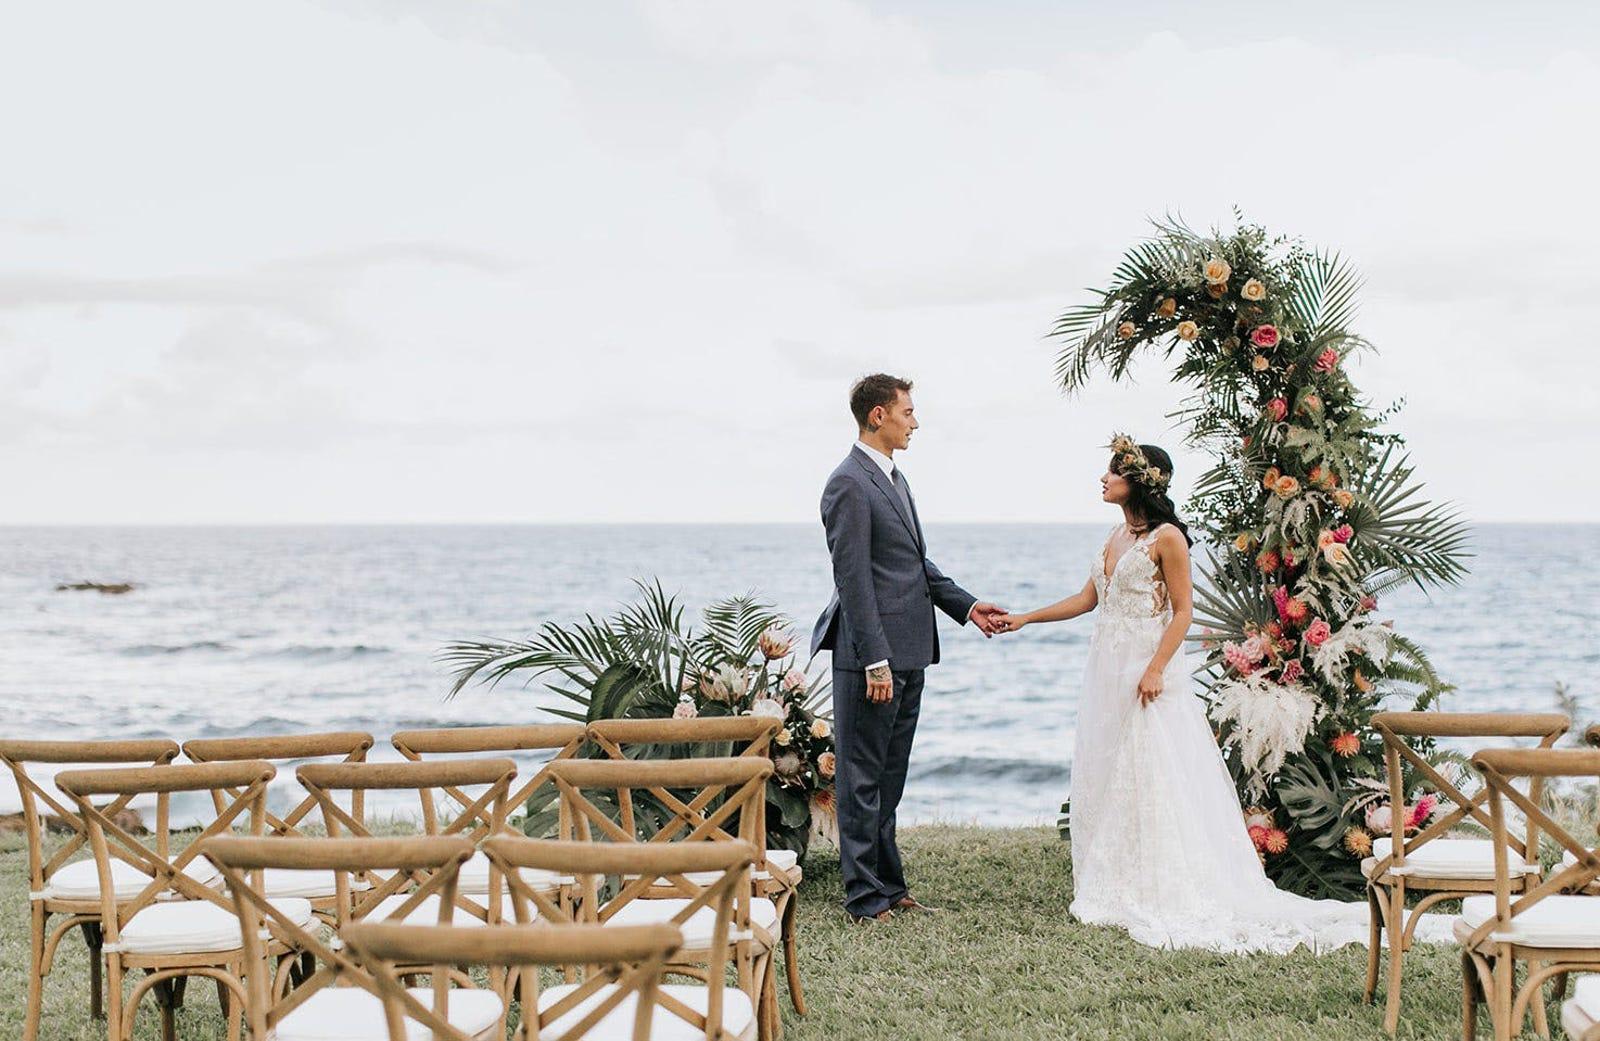 Kansas City Small Wedding Venues   The Vow Exchange   Wedding Chapels in  Missouri